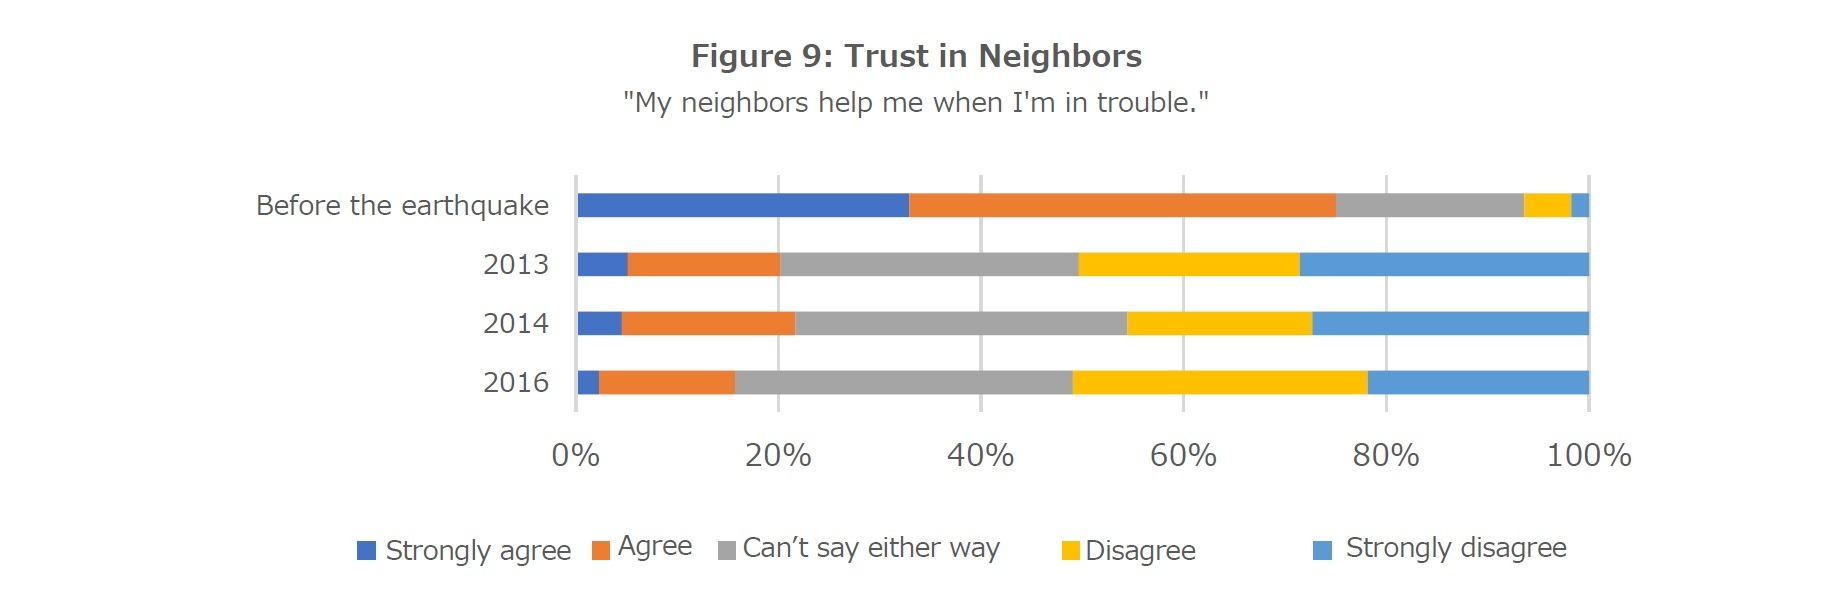 Figure 9: Trust in Neighbors